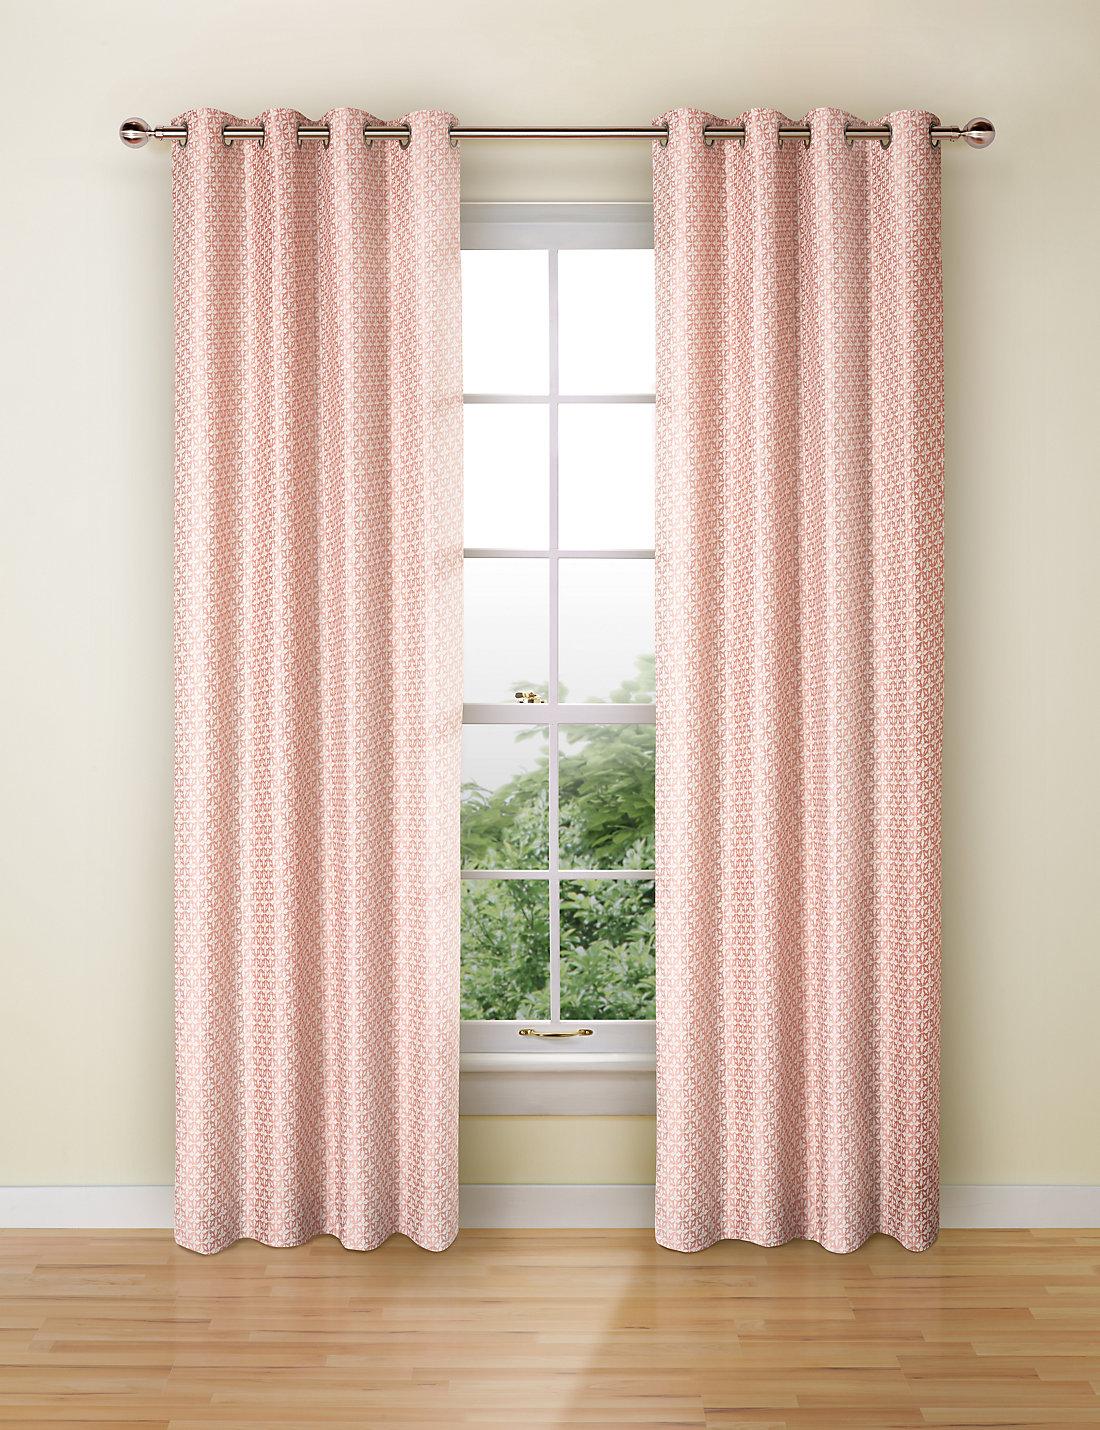 Pink Curtains Carla Diamante Blackout Ring Top Curtains Pink Exclusive Fabrics Pink Polka Dot